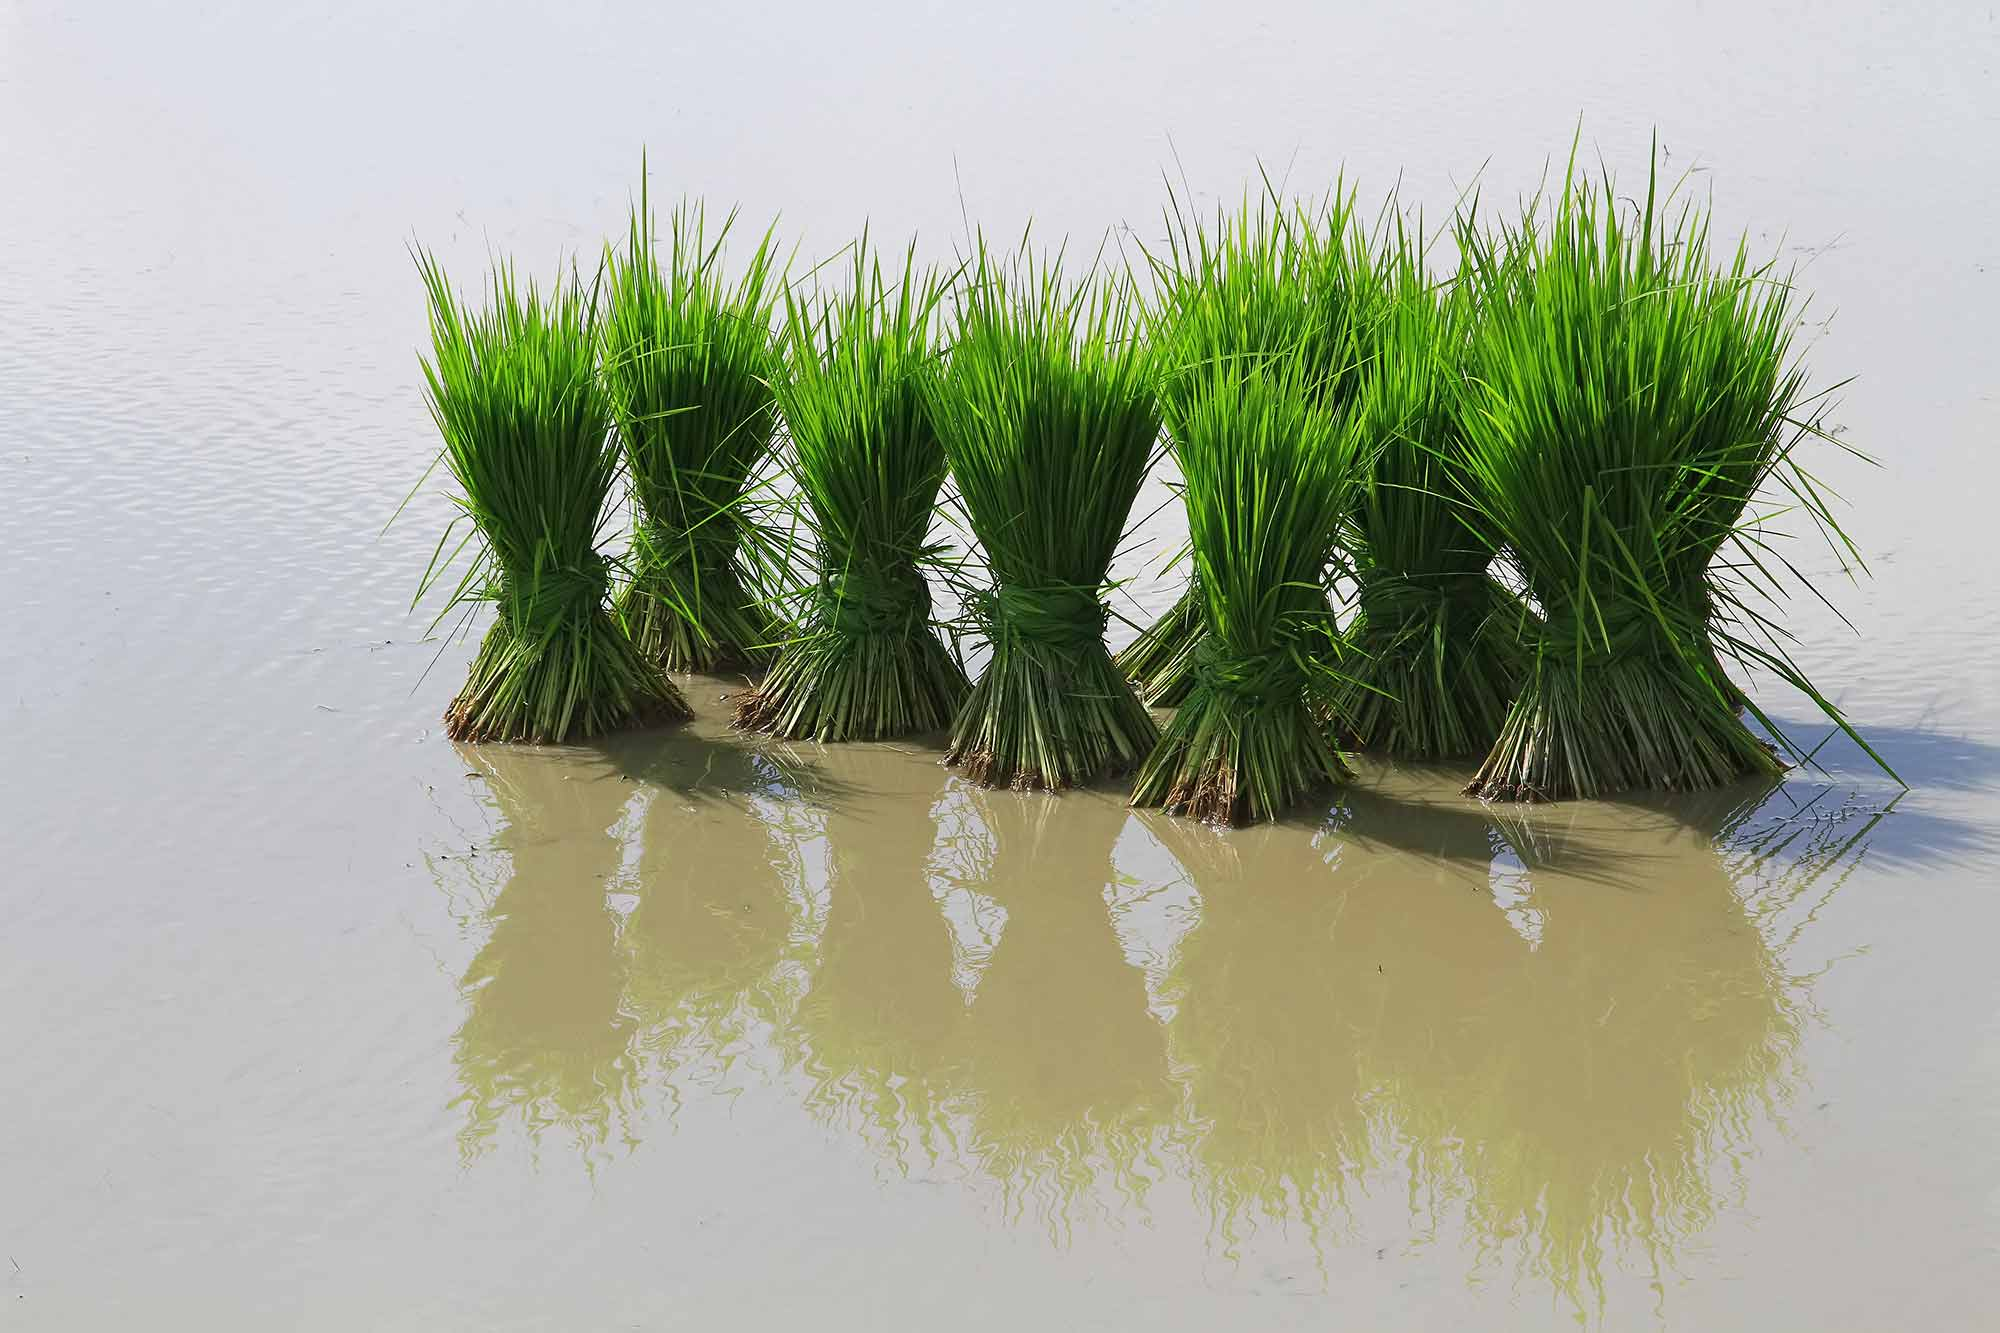 Harvested rice in Galachipa. © Ulli Maier & Nisa Maier